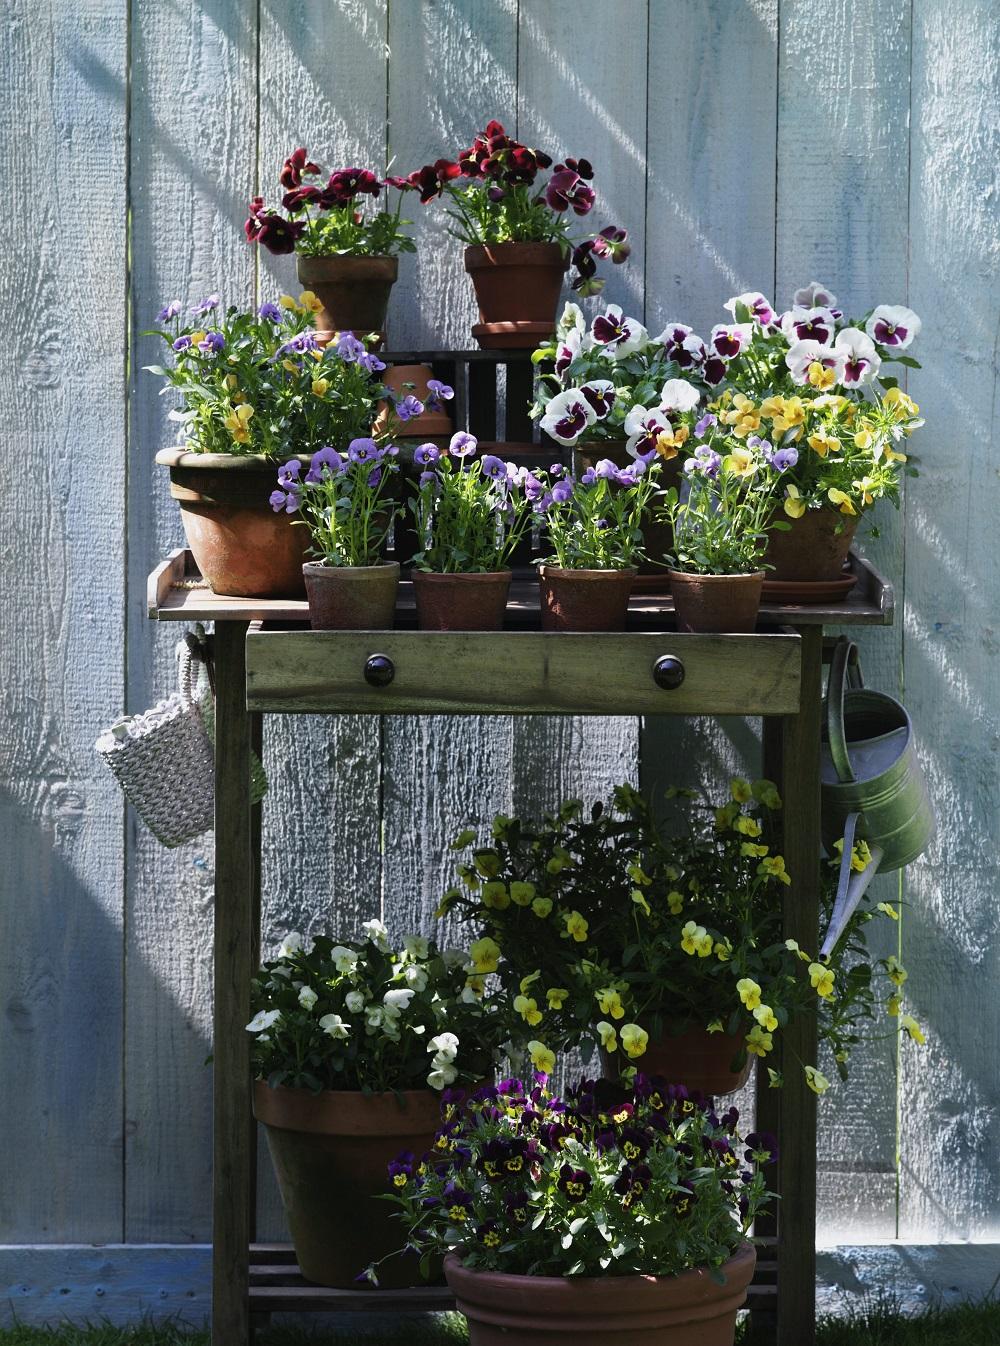 Gartensaison - Garten-CH - NaturLust #14 - Seite 29_5